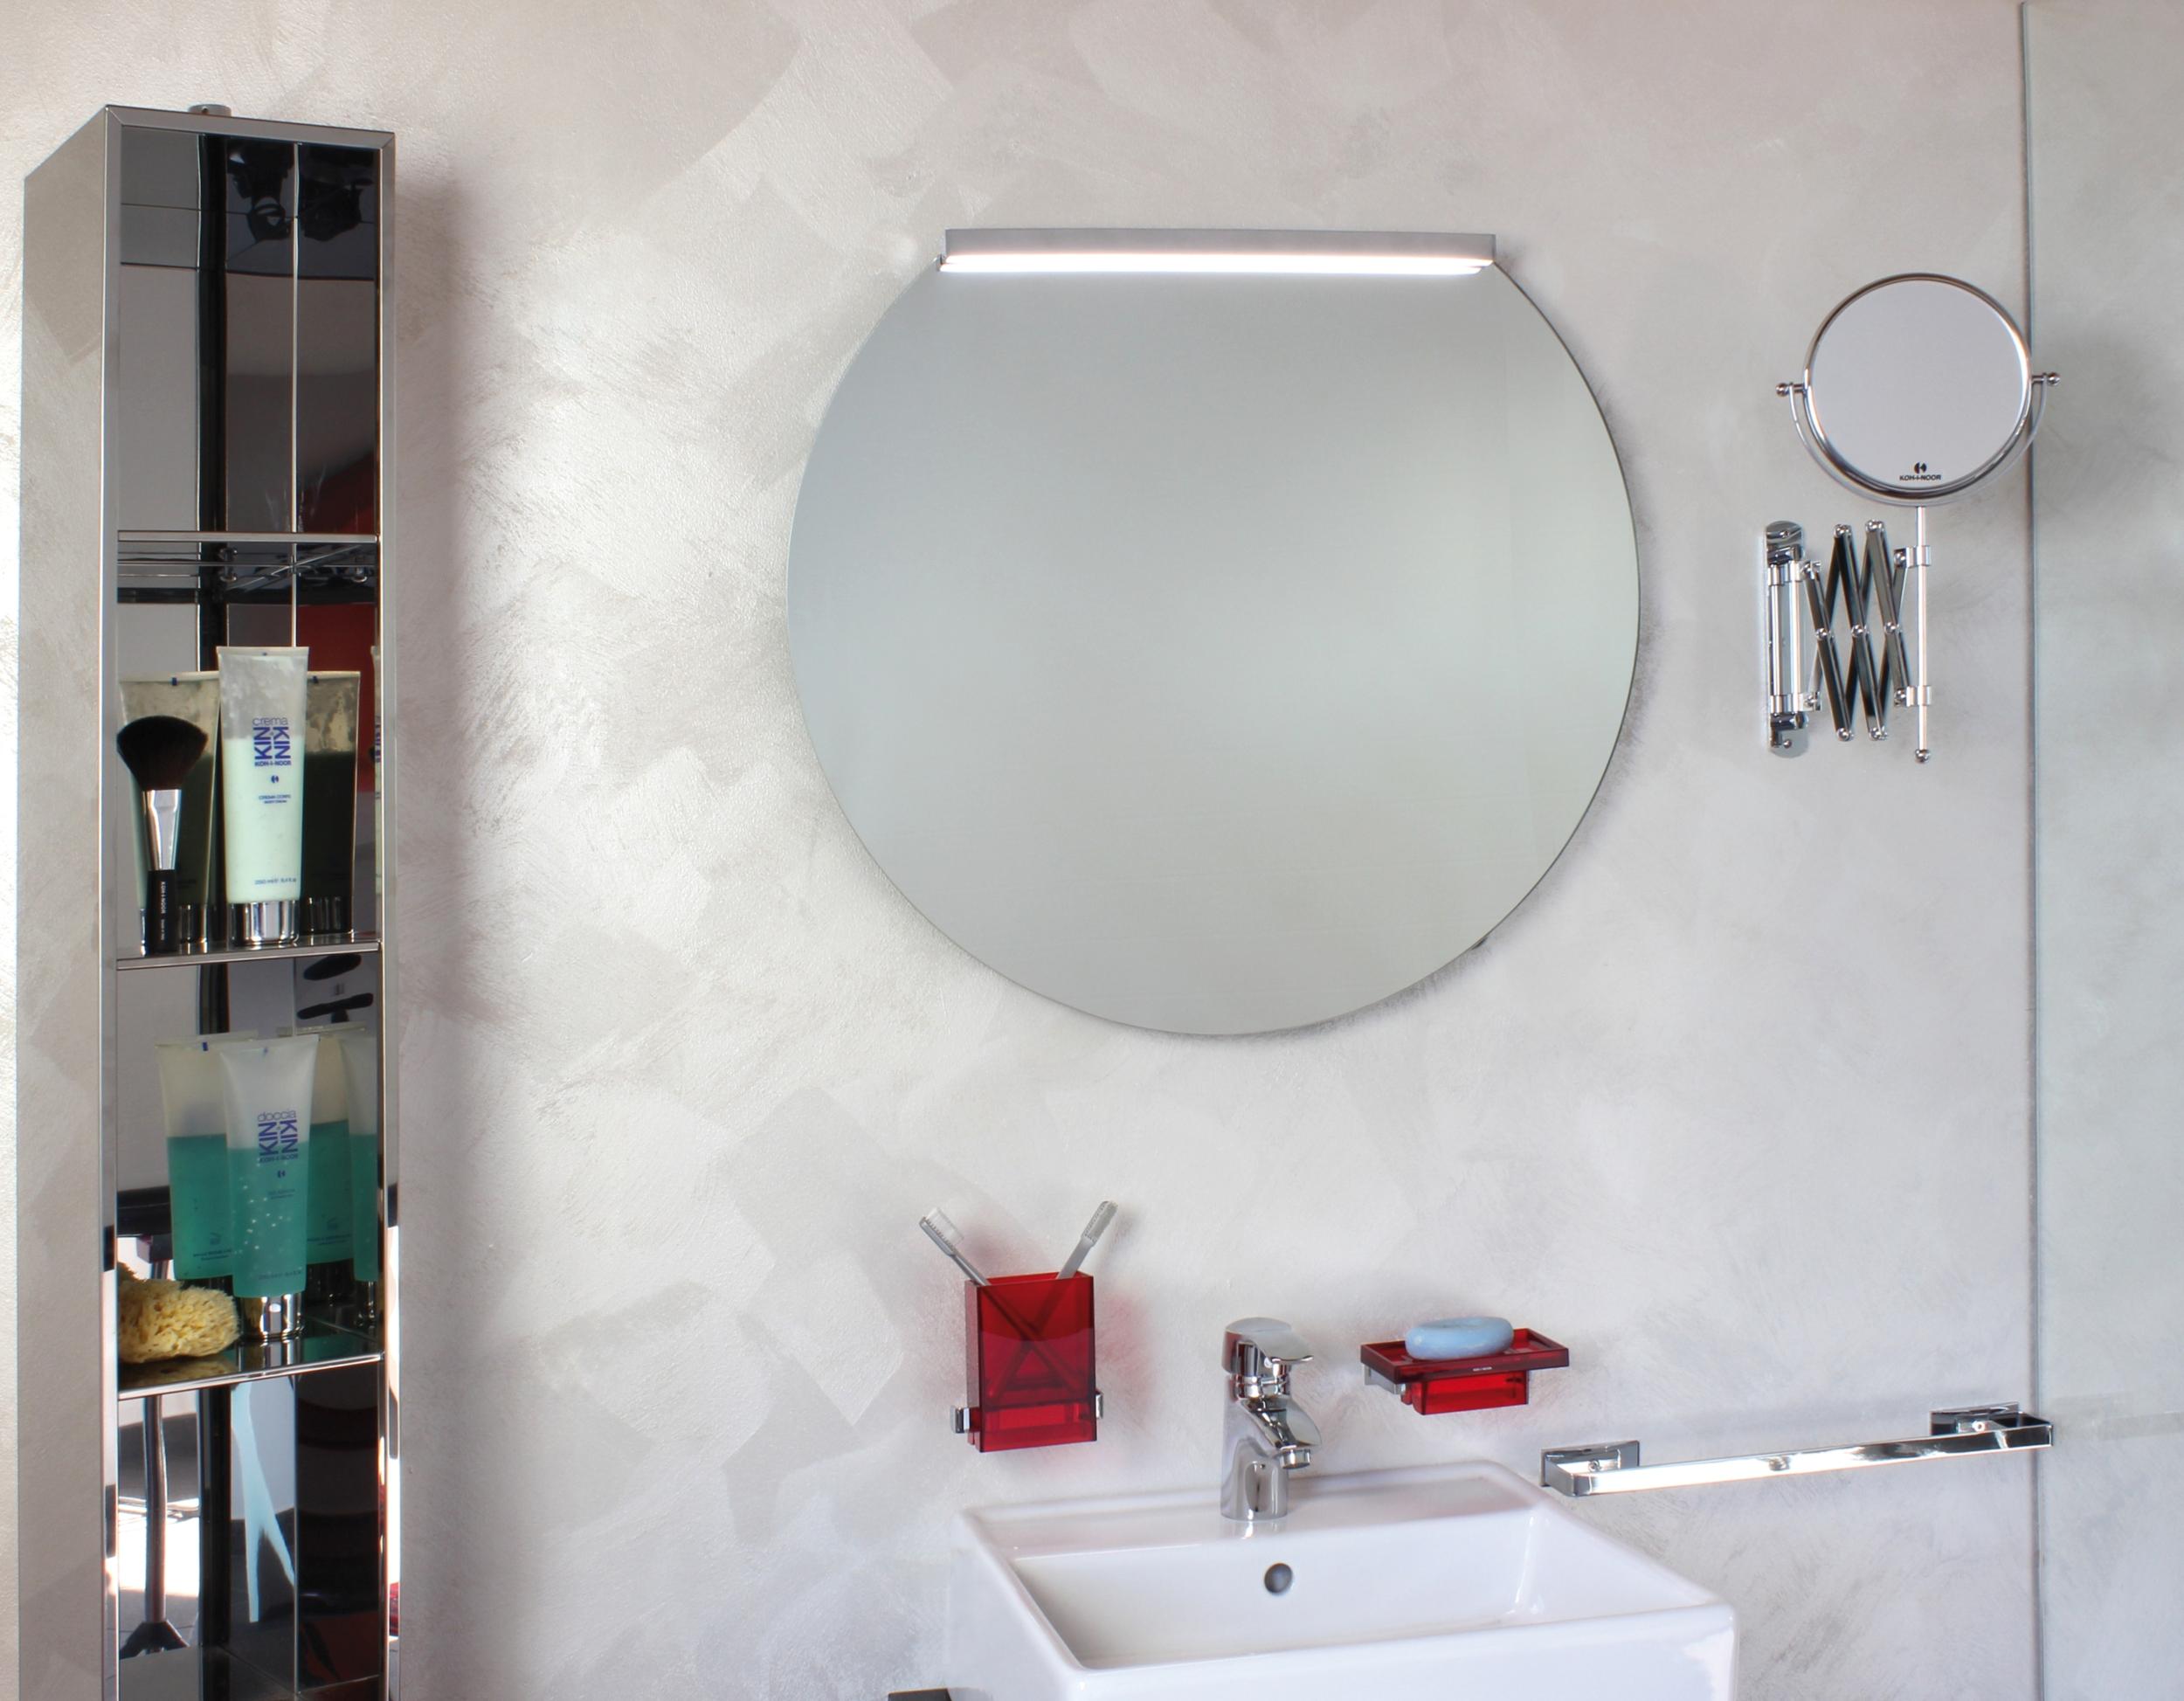 koh i noor filo lucido tronco abgeschnittener runder spiegel mit kantenschliff 800 x 704 mm 45580. Black Bedroom Furniture Sets. Home Design Ideas